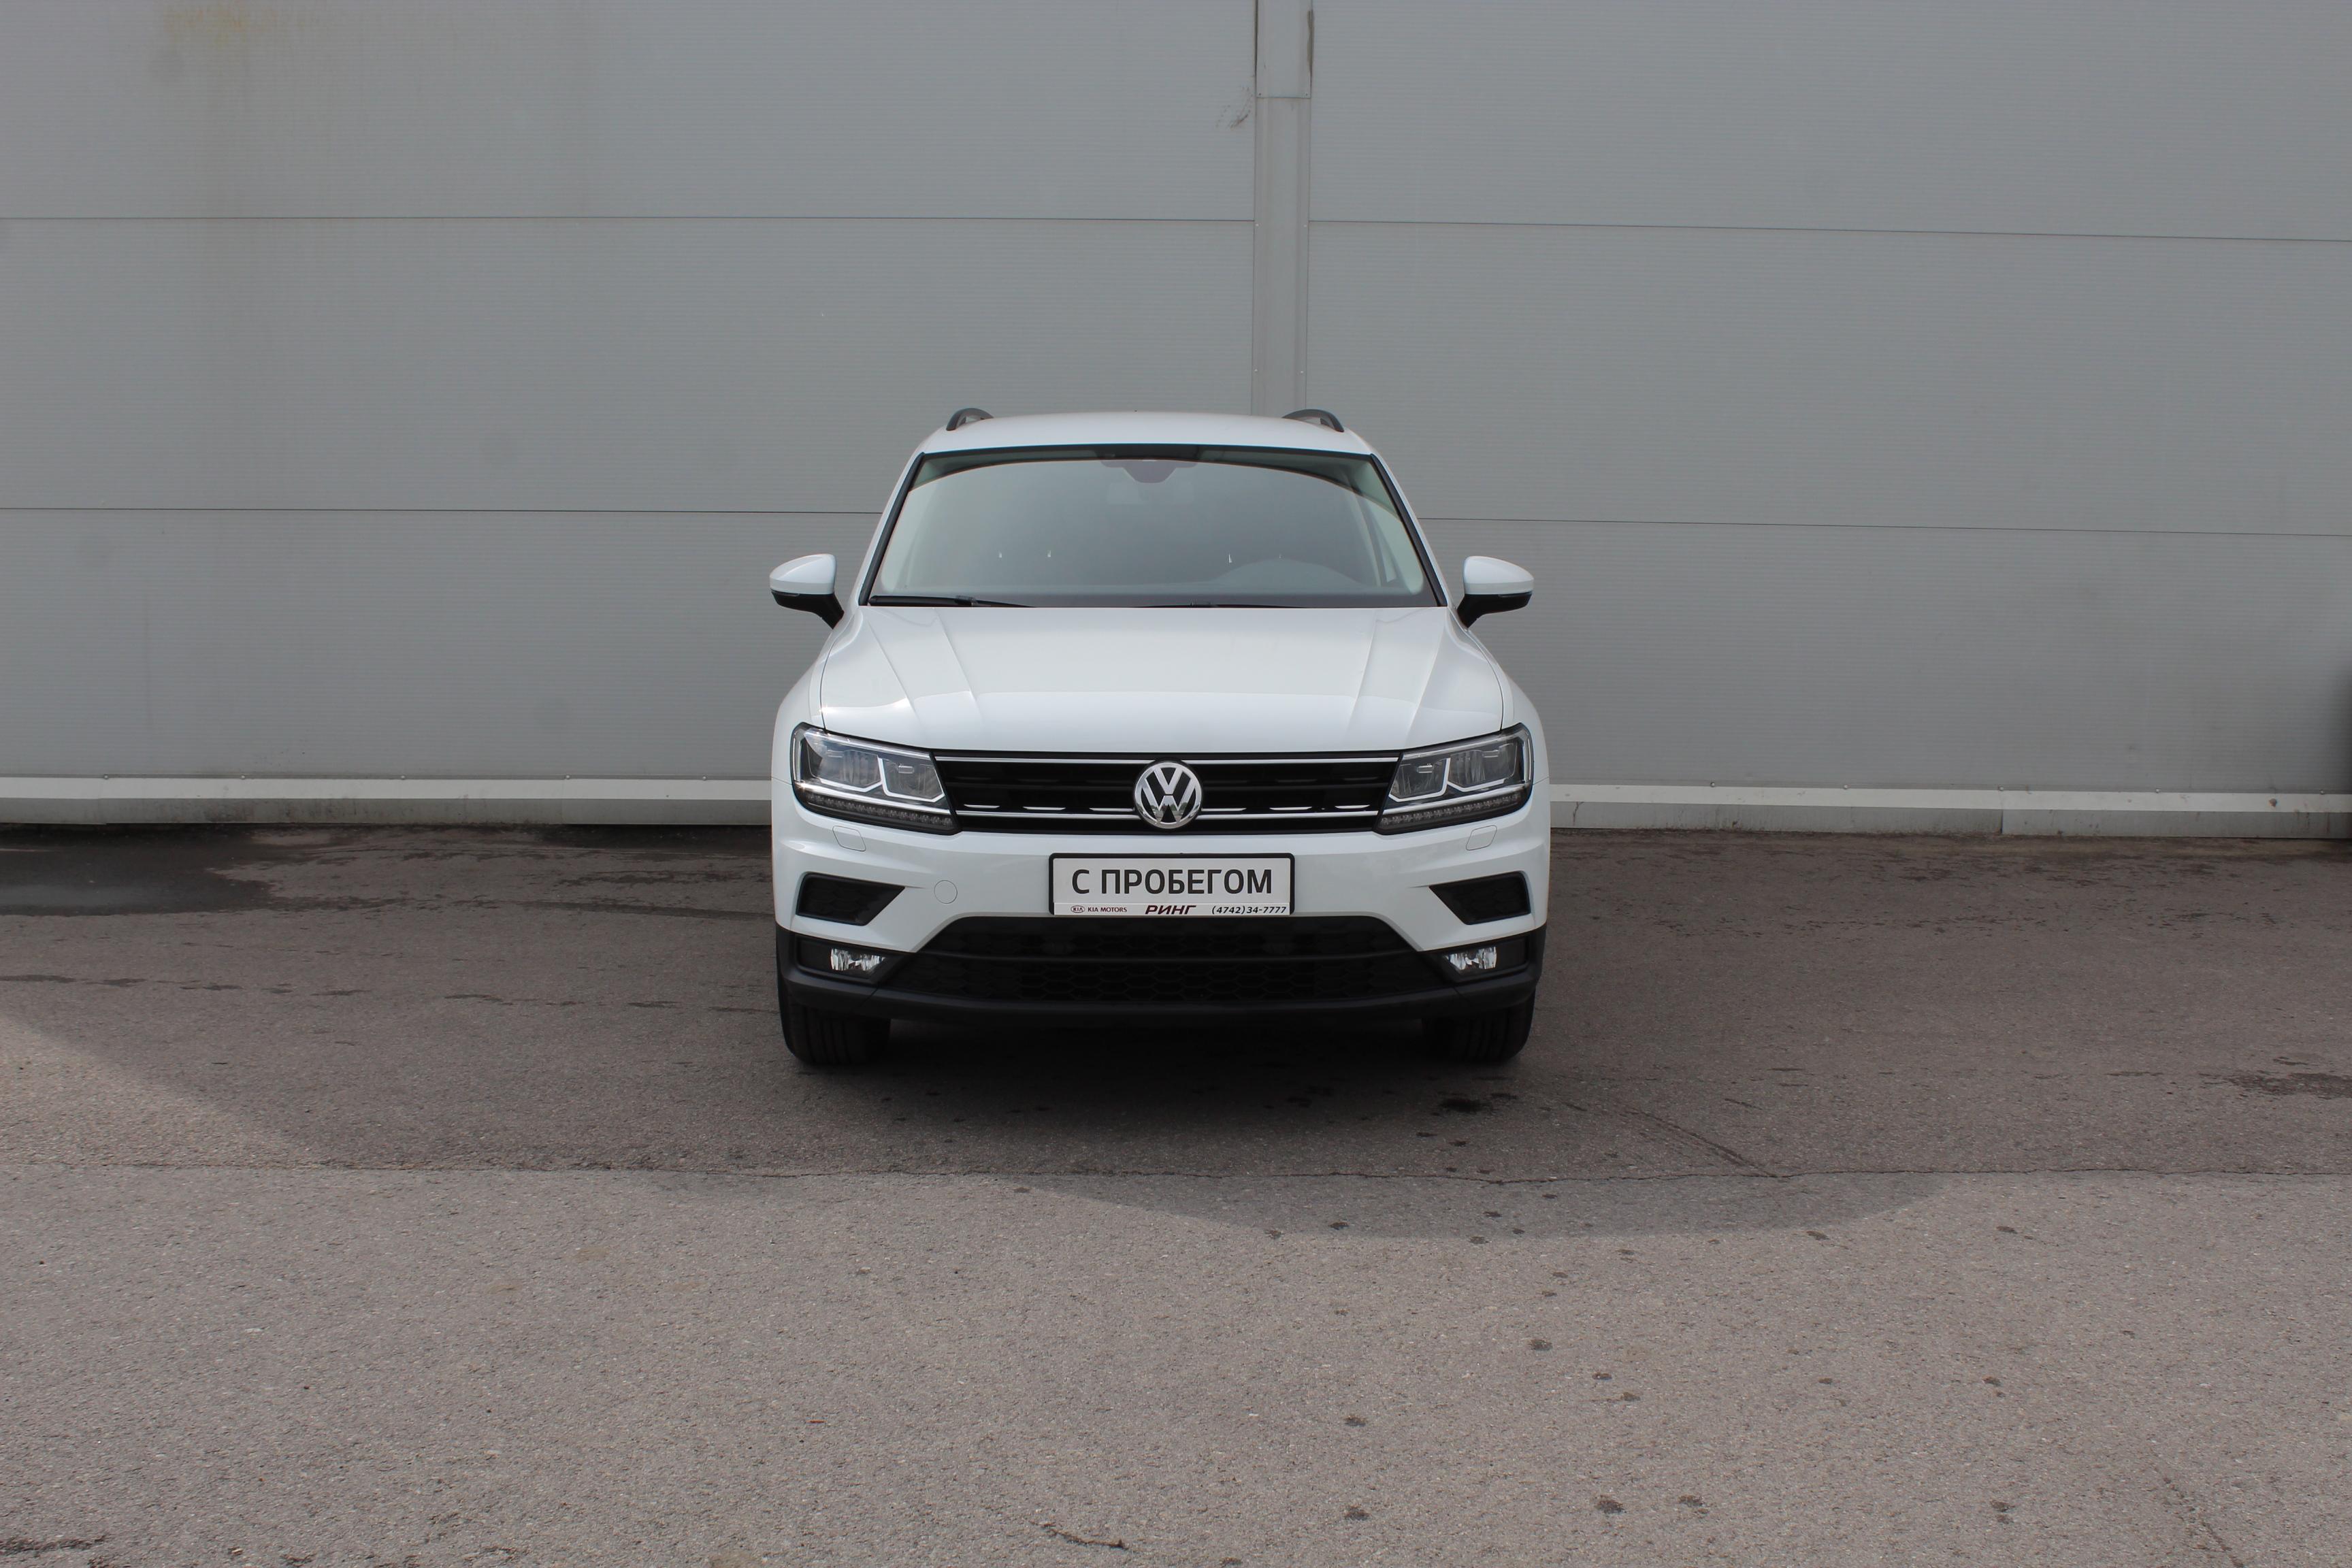 Volkswagen Tiguan Внедорожник (2020г.)